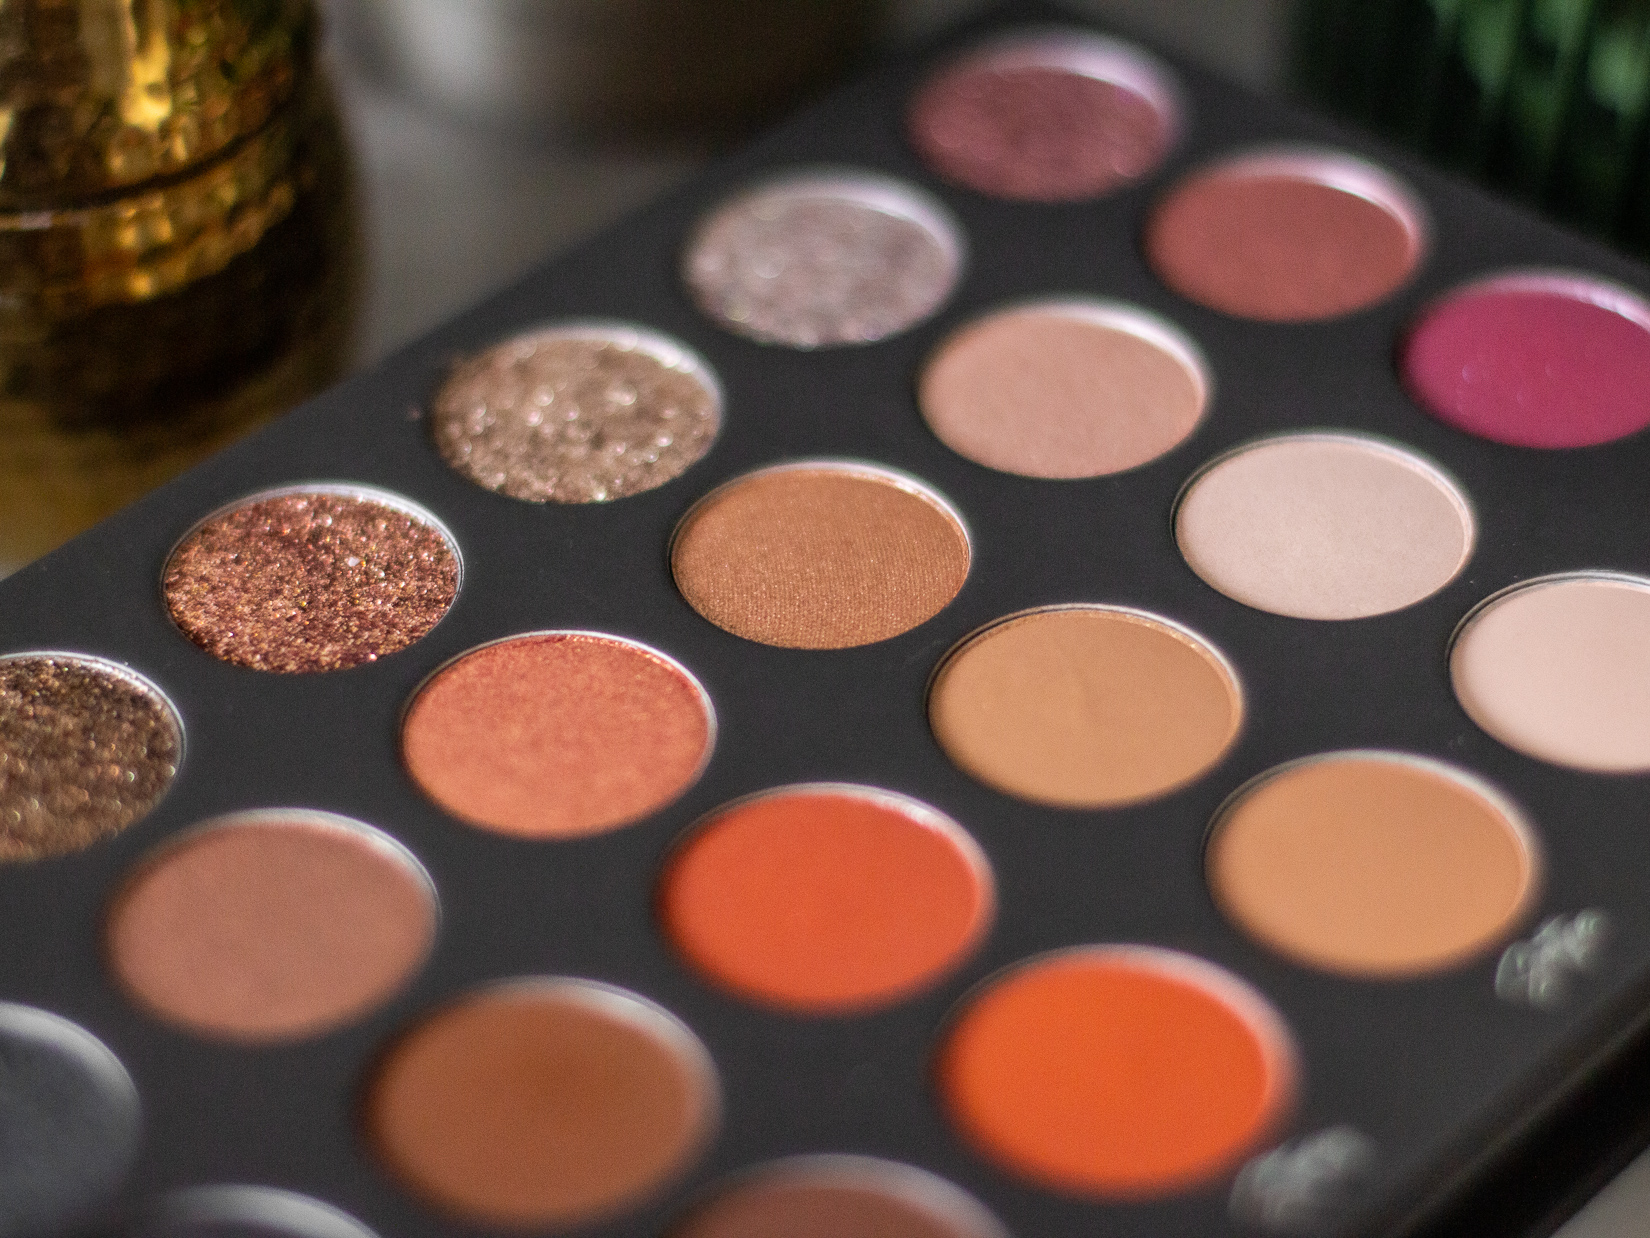 tati beauty textured neutrals vol. 1 recenze a zkušenosti blog